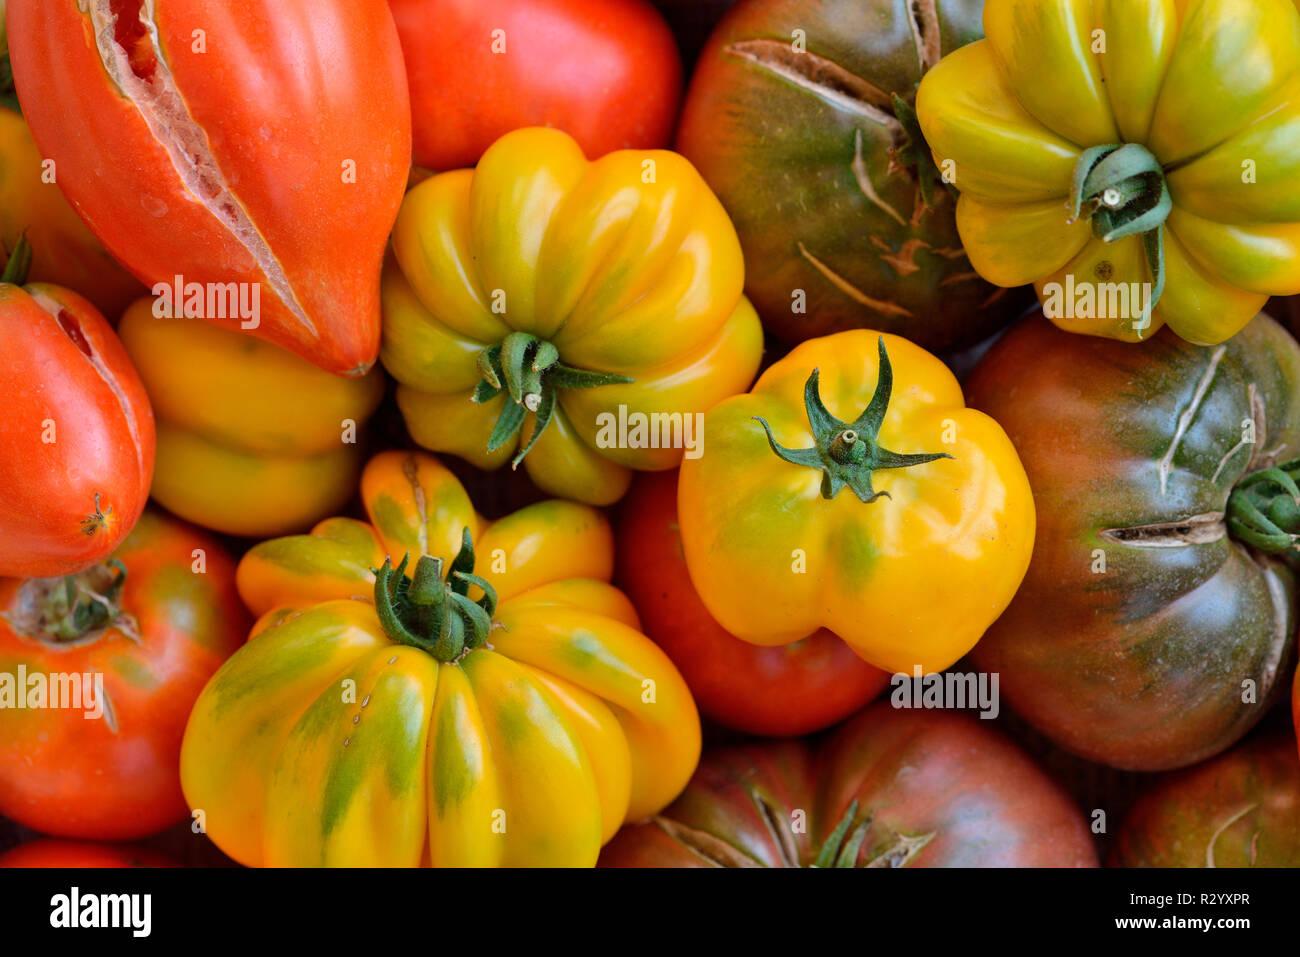 Different varieties of organic tomatoes (Solanum lycopersicum), Herault, France - Stock Image